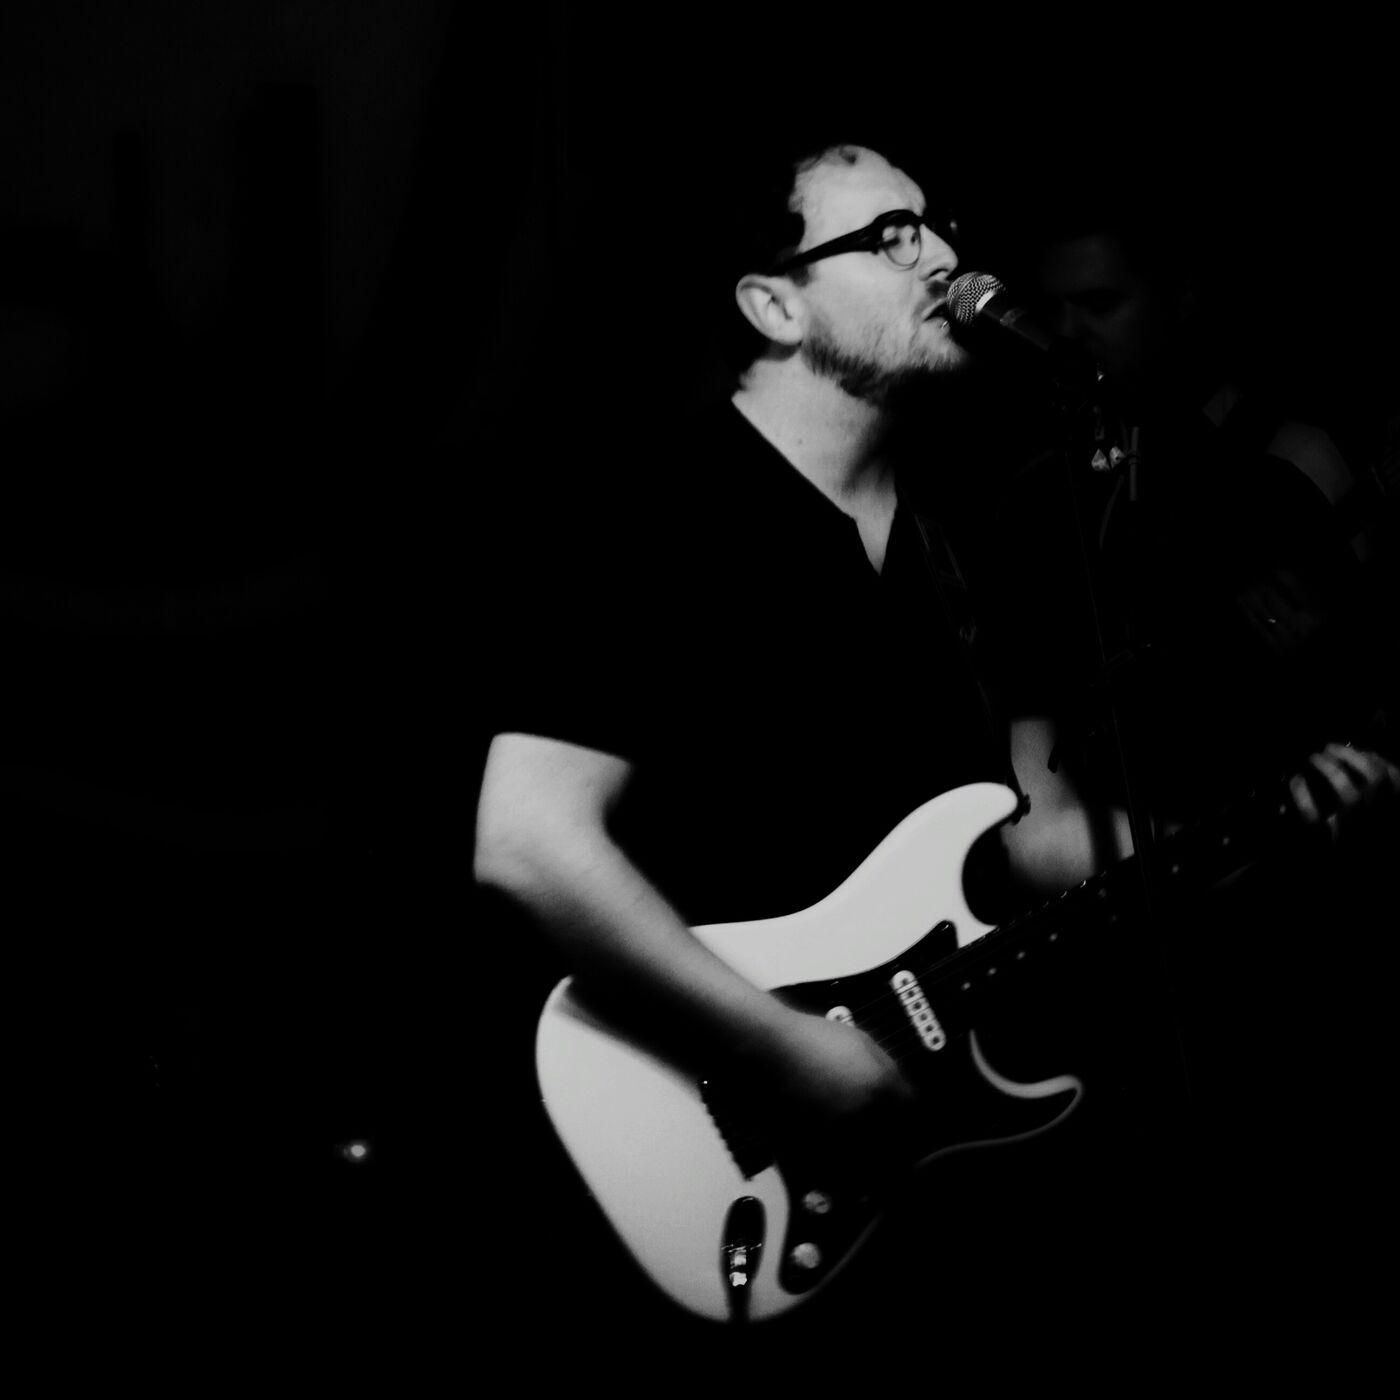 [Bonus] Music Mashtun, Jesse Gimbel performs Untitled!